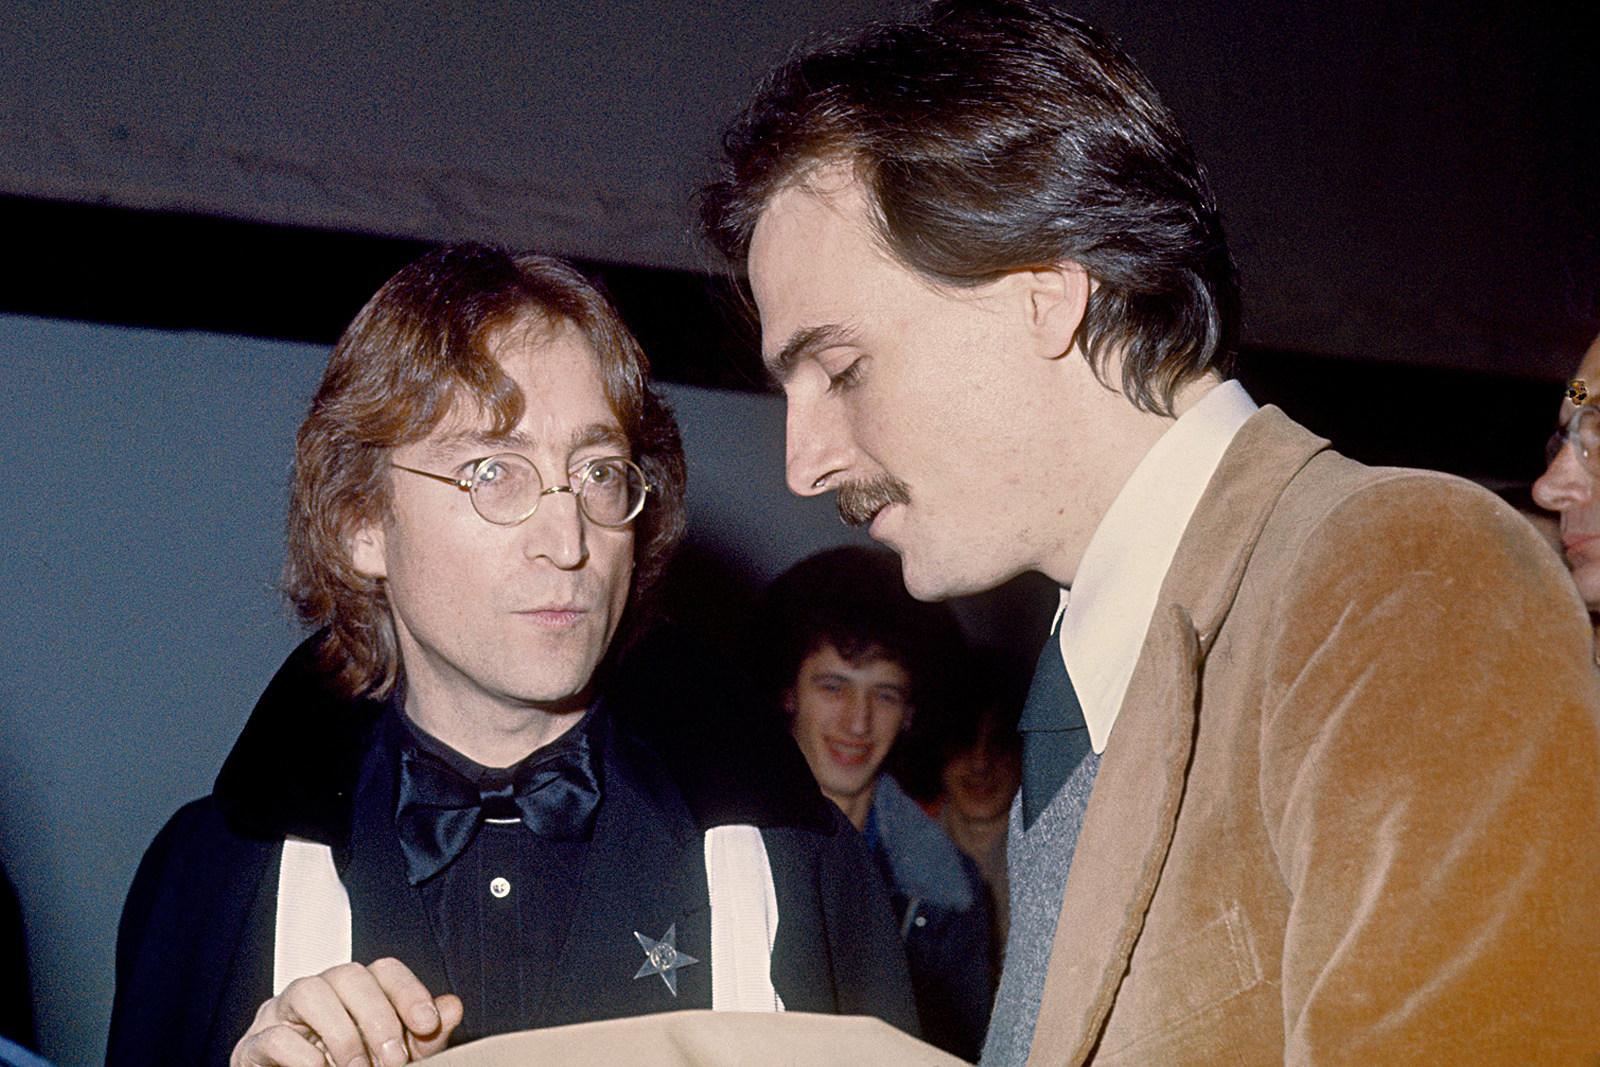 James Taylor Recalls Giving Opiates To John Lennon